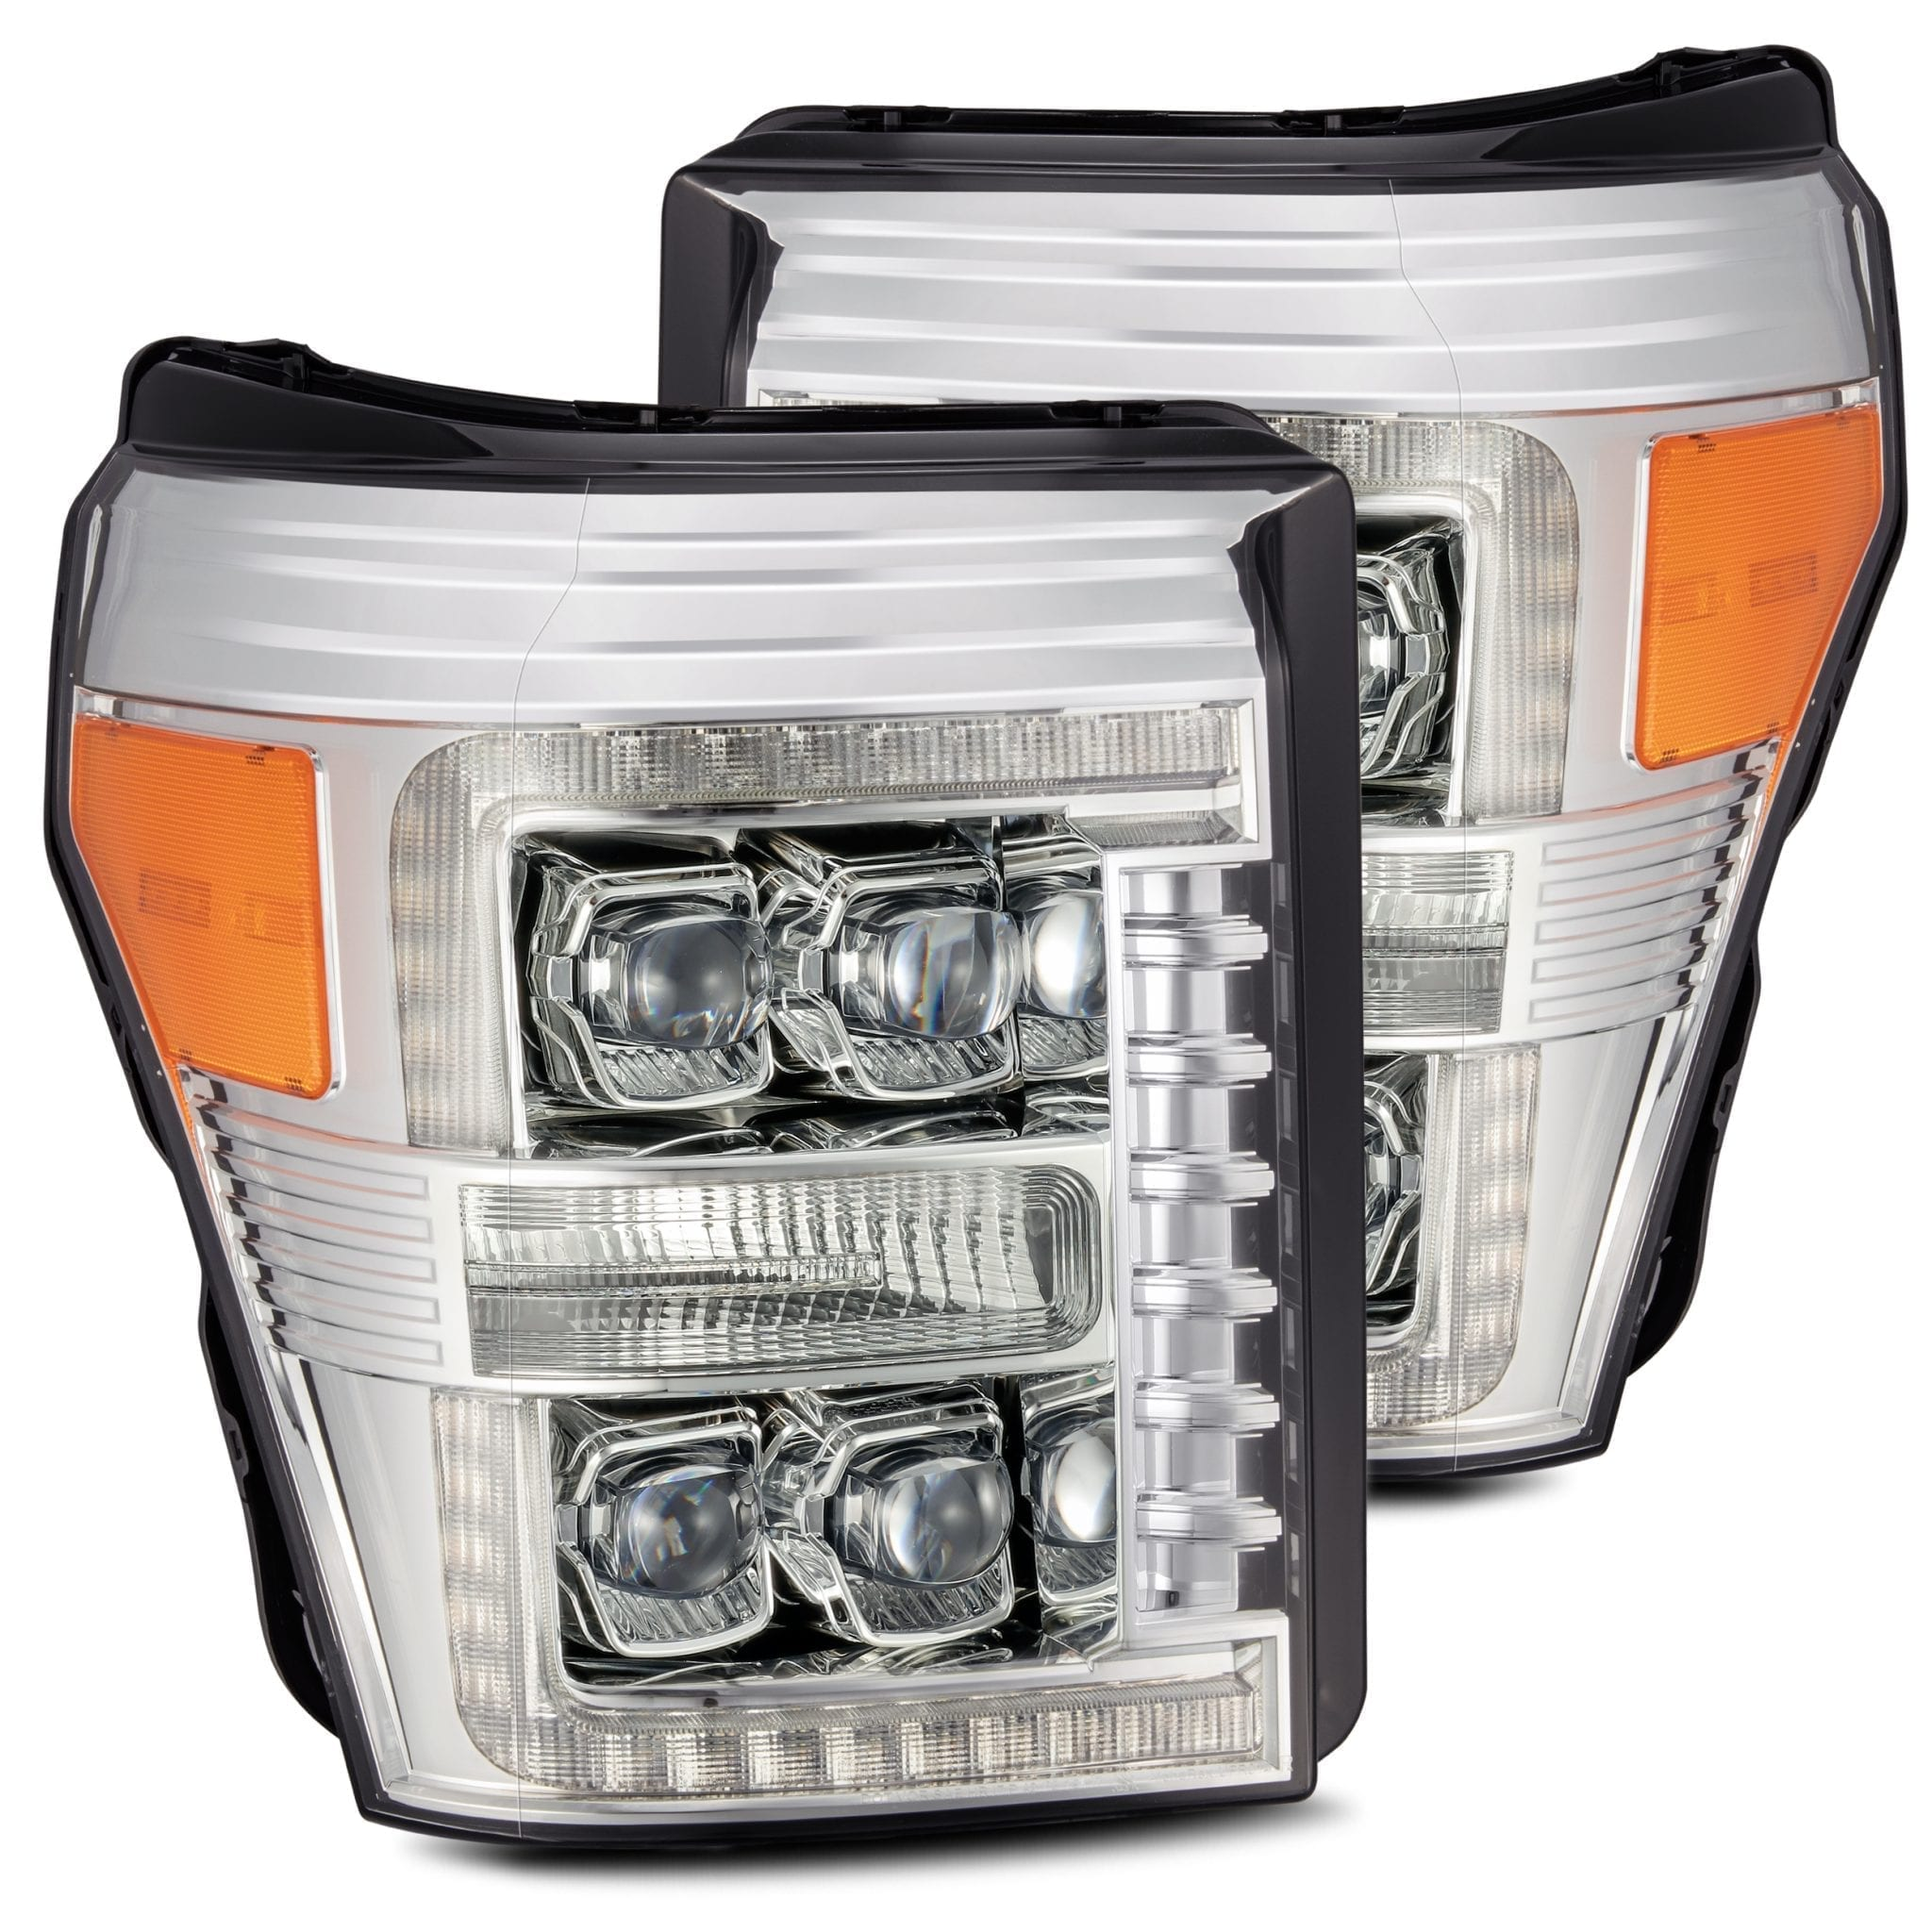 2011 2012 2013 2014 2015 2016 Ford F250 F350 F450 F550 Super Duty NOVA-Series Full LED Projector Headlights Chrome